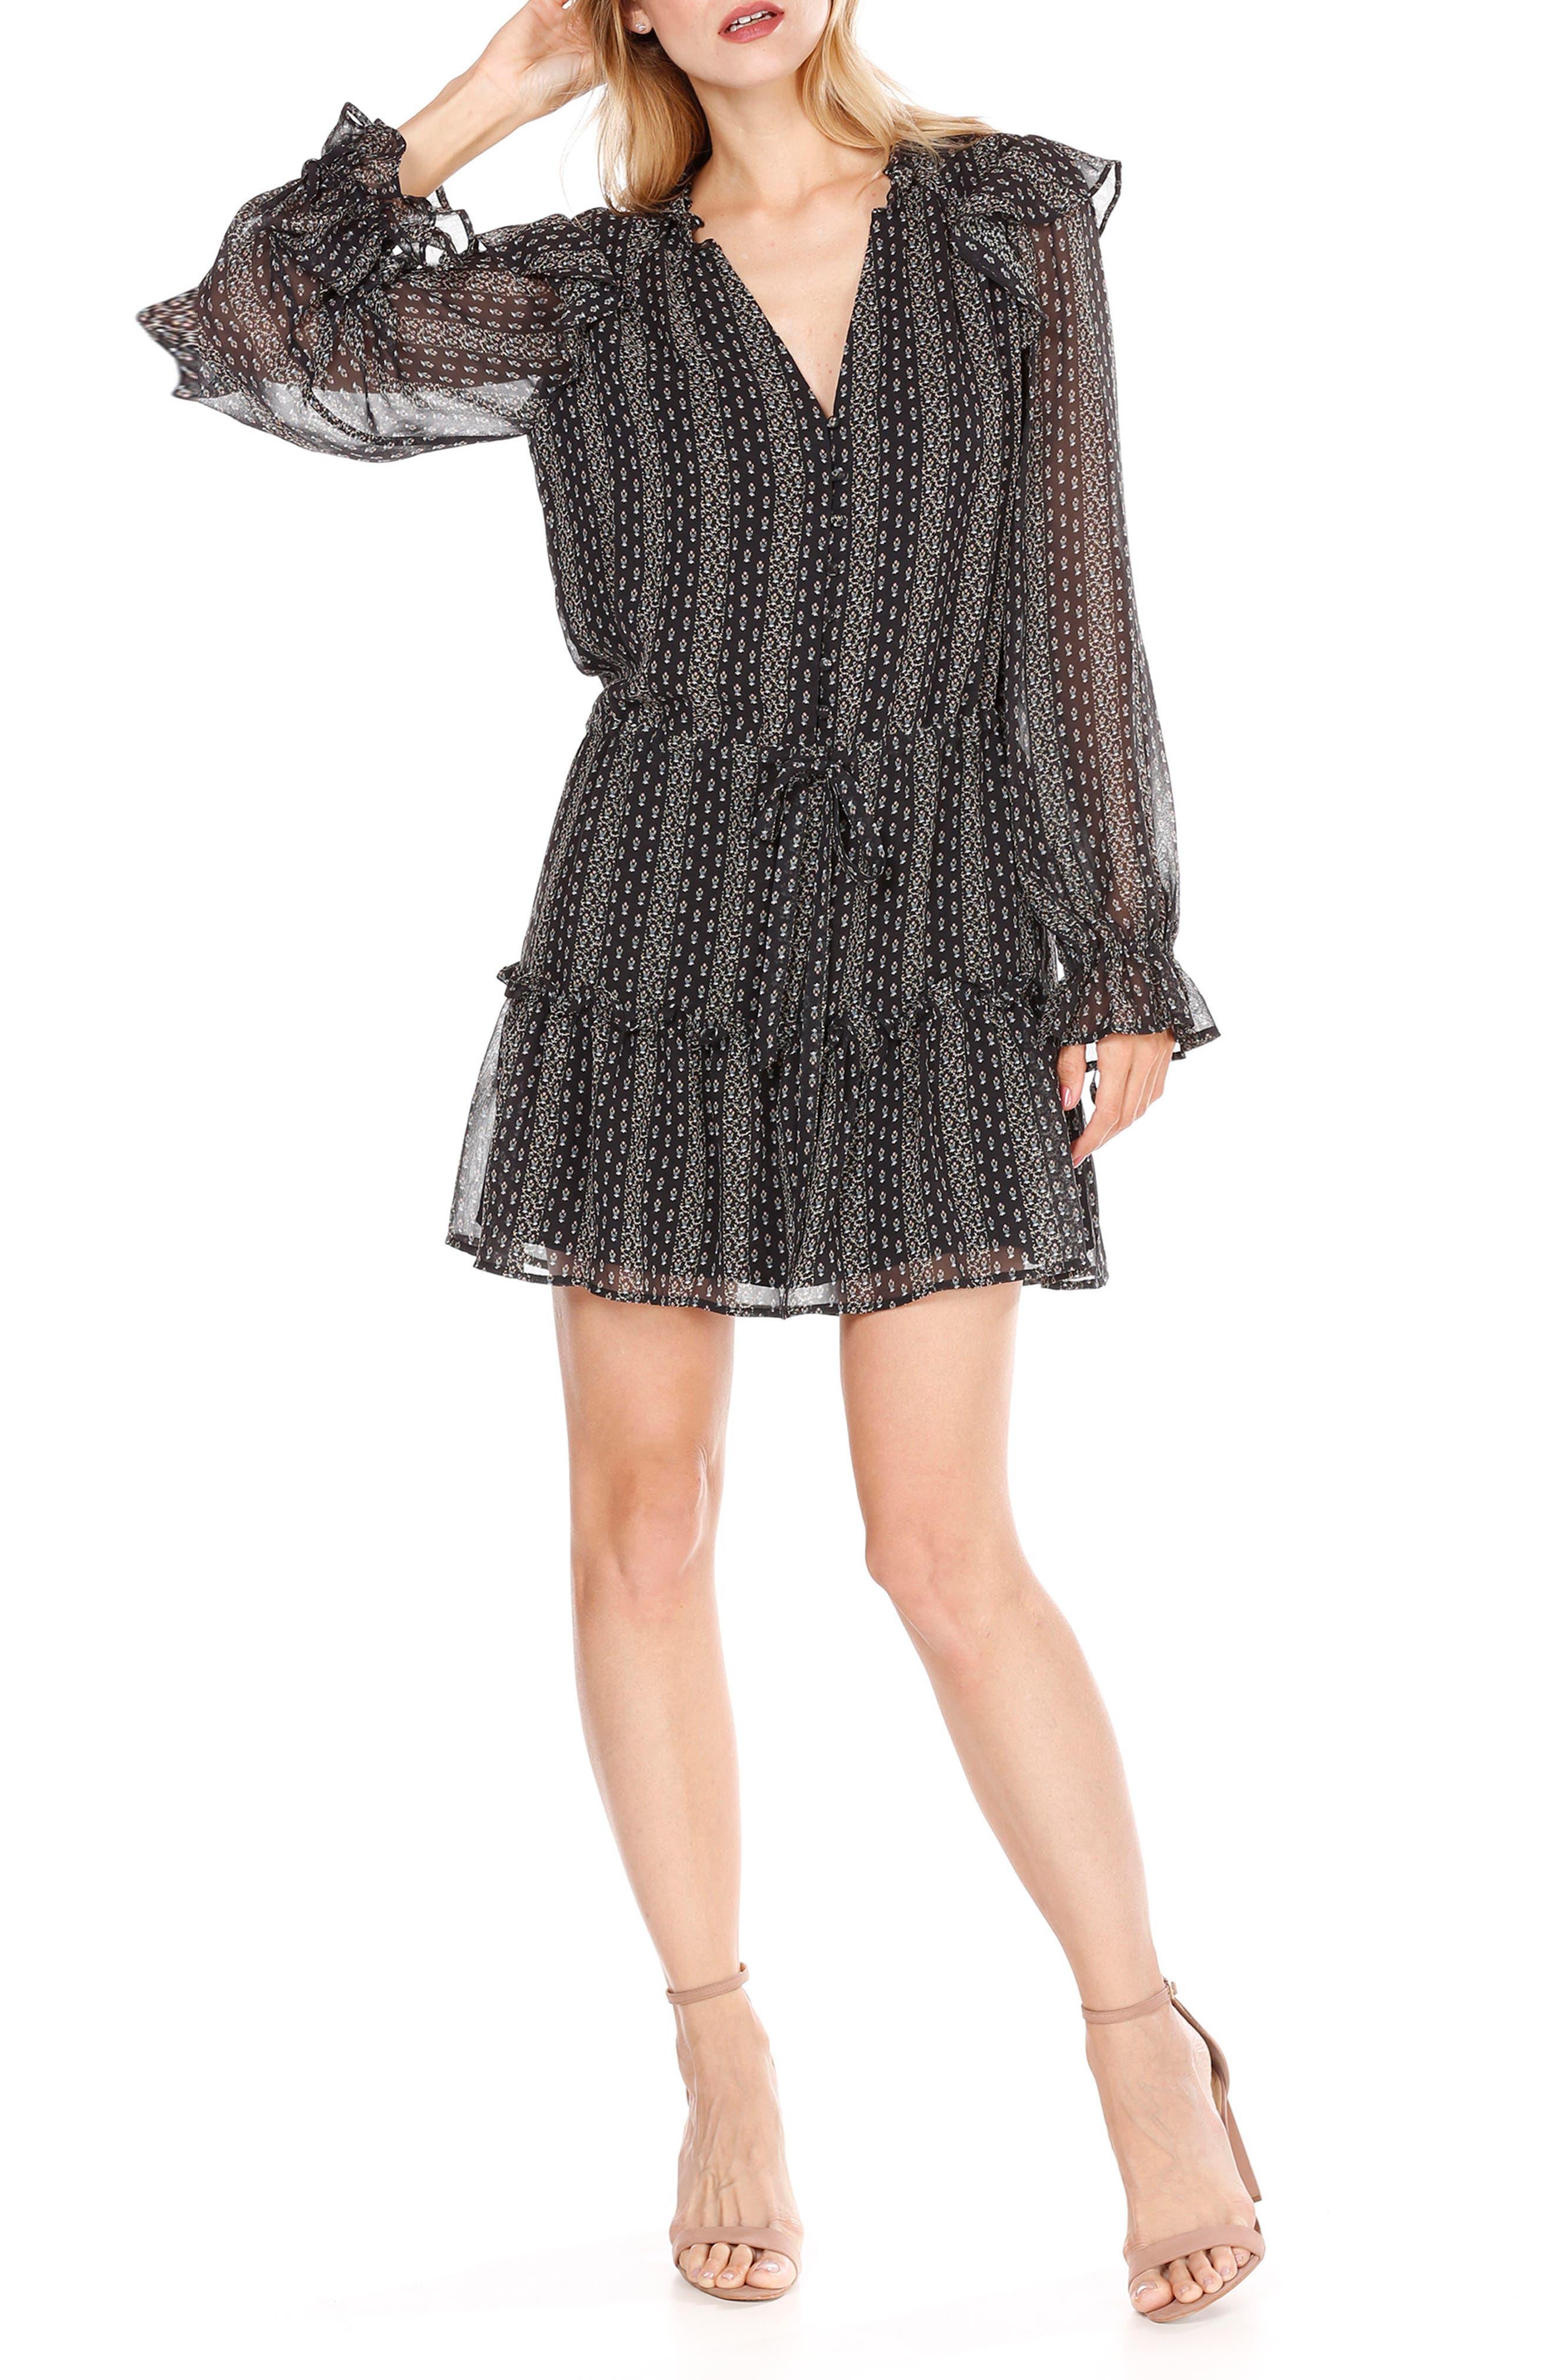 Pomello Silk Blouson Dress,                             Main thumbnail 1, color,                             001